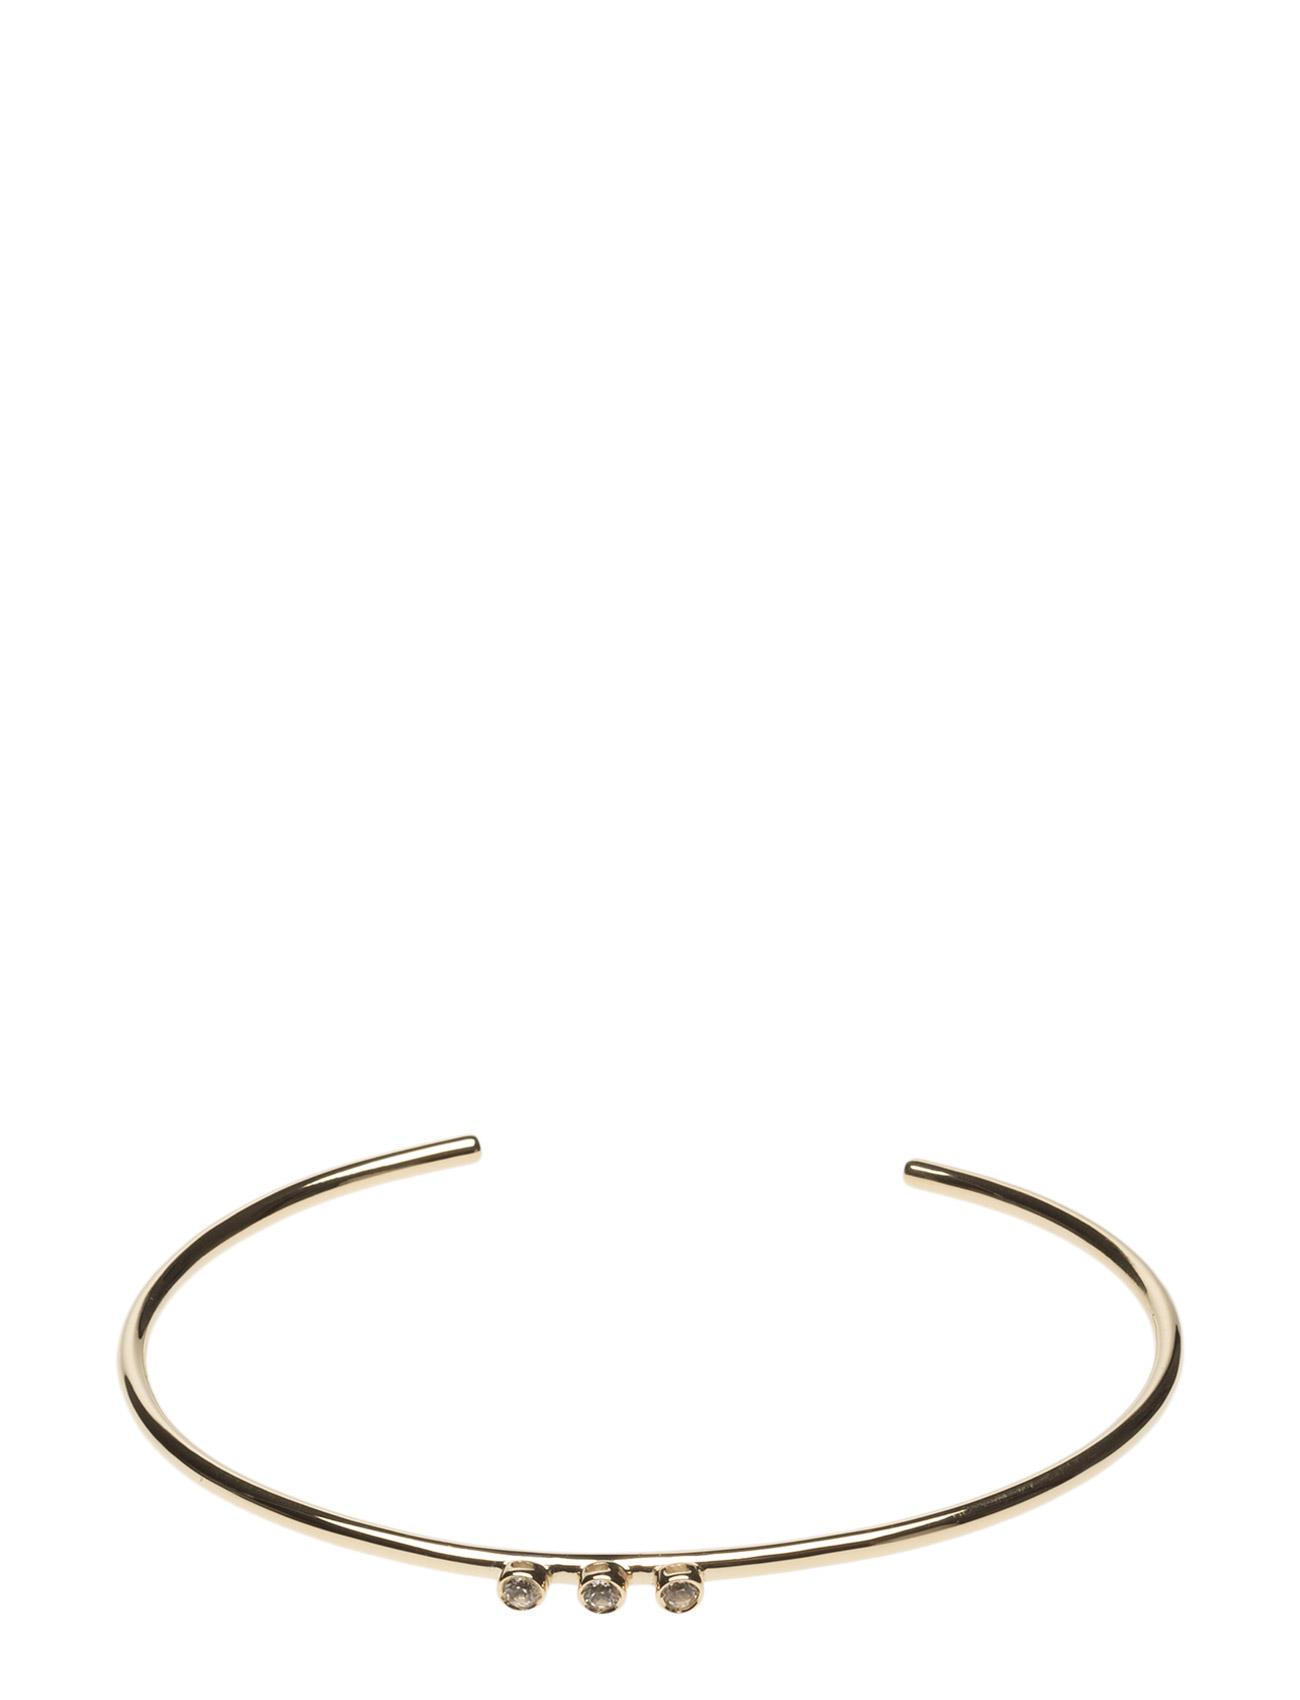 Cuff Tube 2mm 3 Stone Bracelet Lola's Love Smykker til Kvinder i Guld